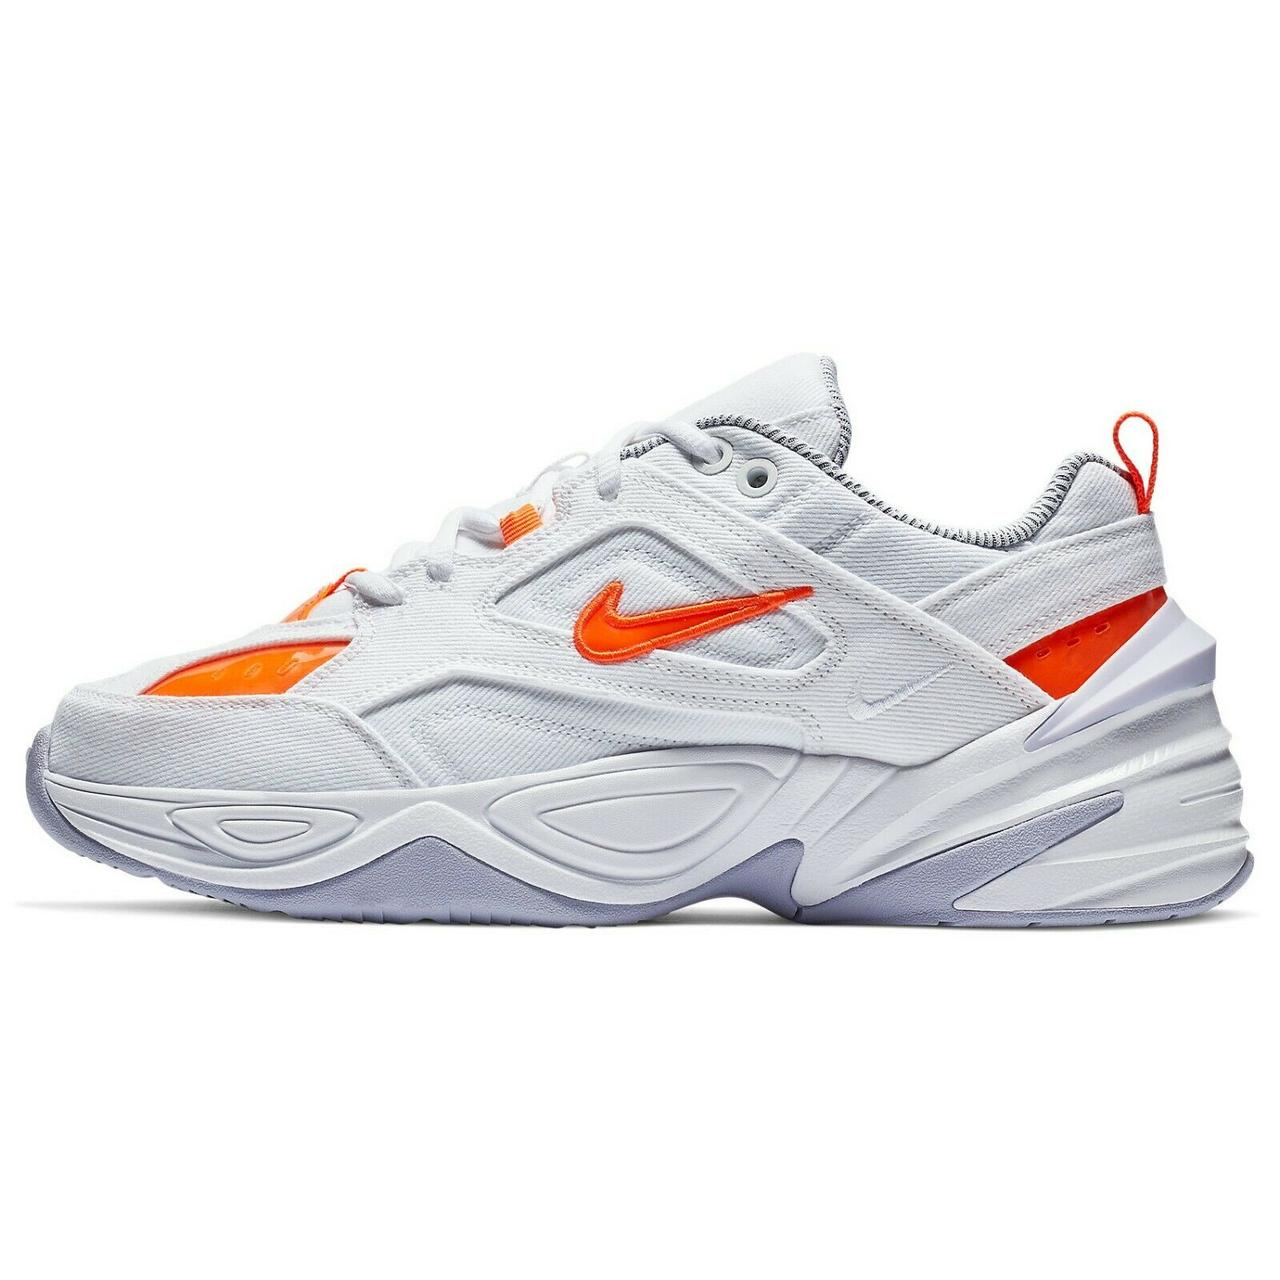 Кроссовки Nike Air Monarch M2K Tekno White Hyper Crimson белые женские